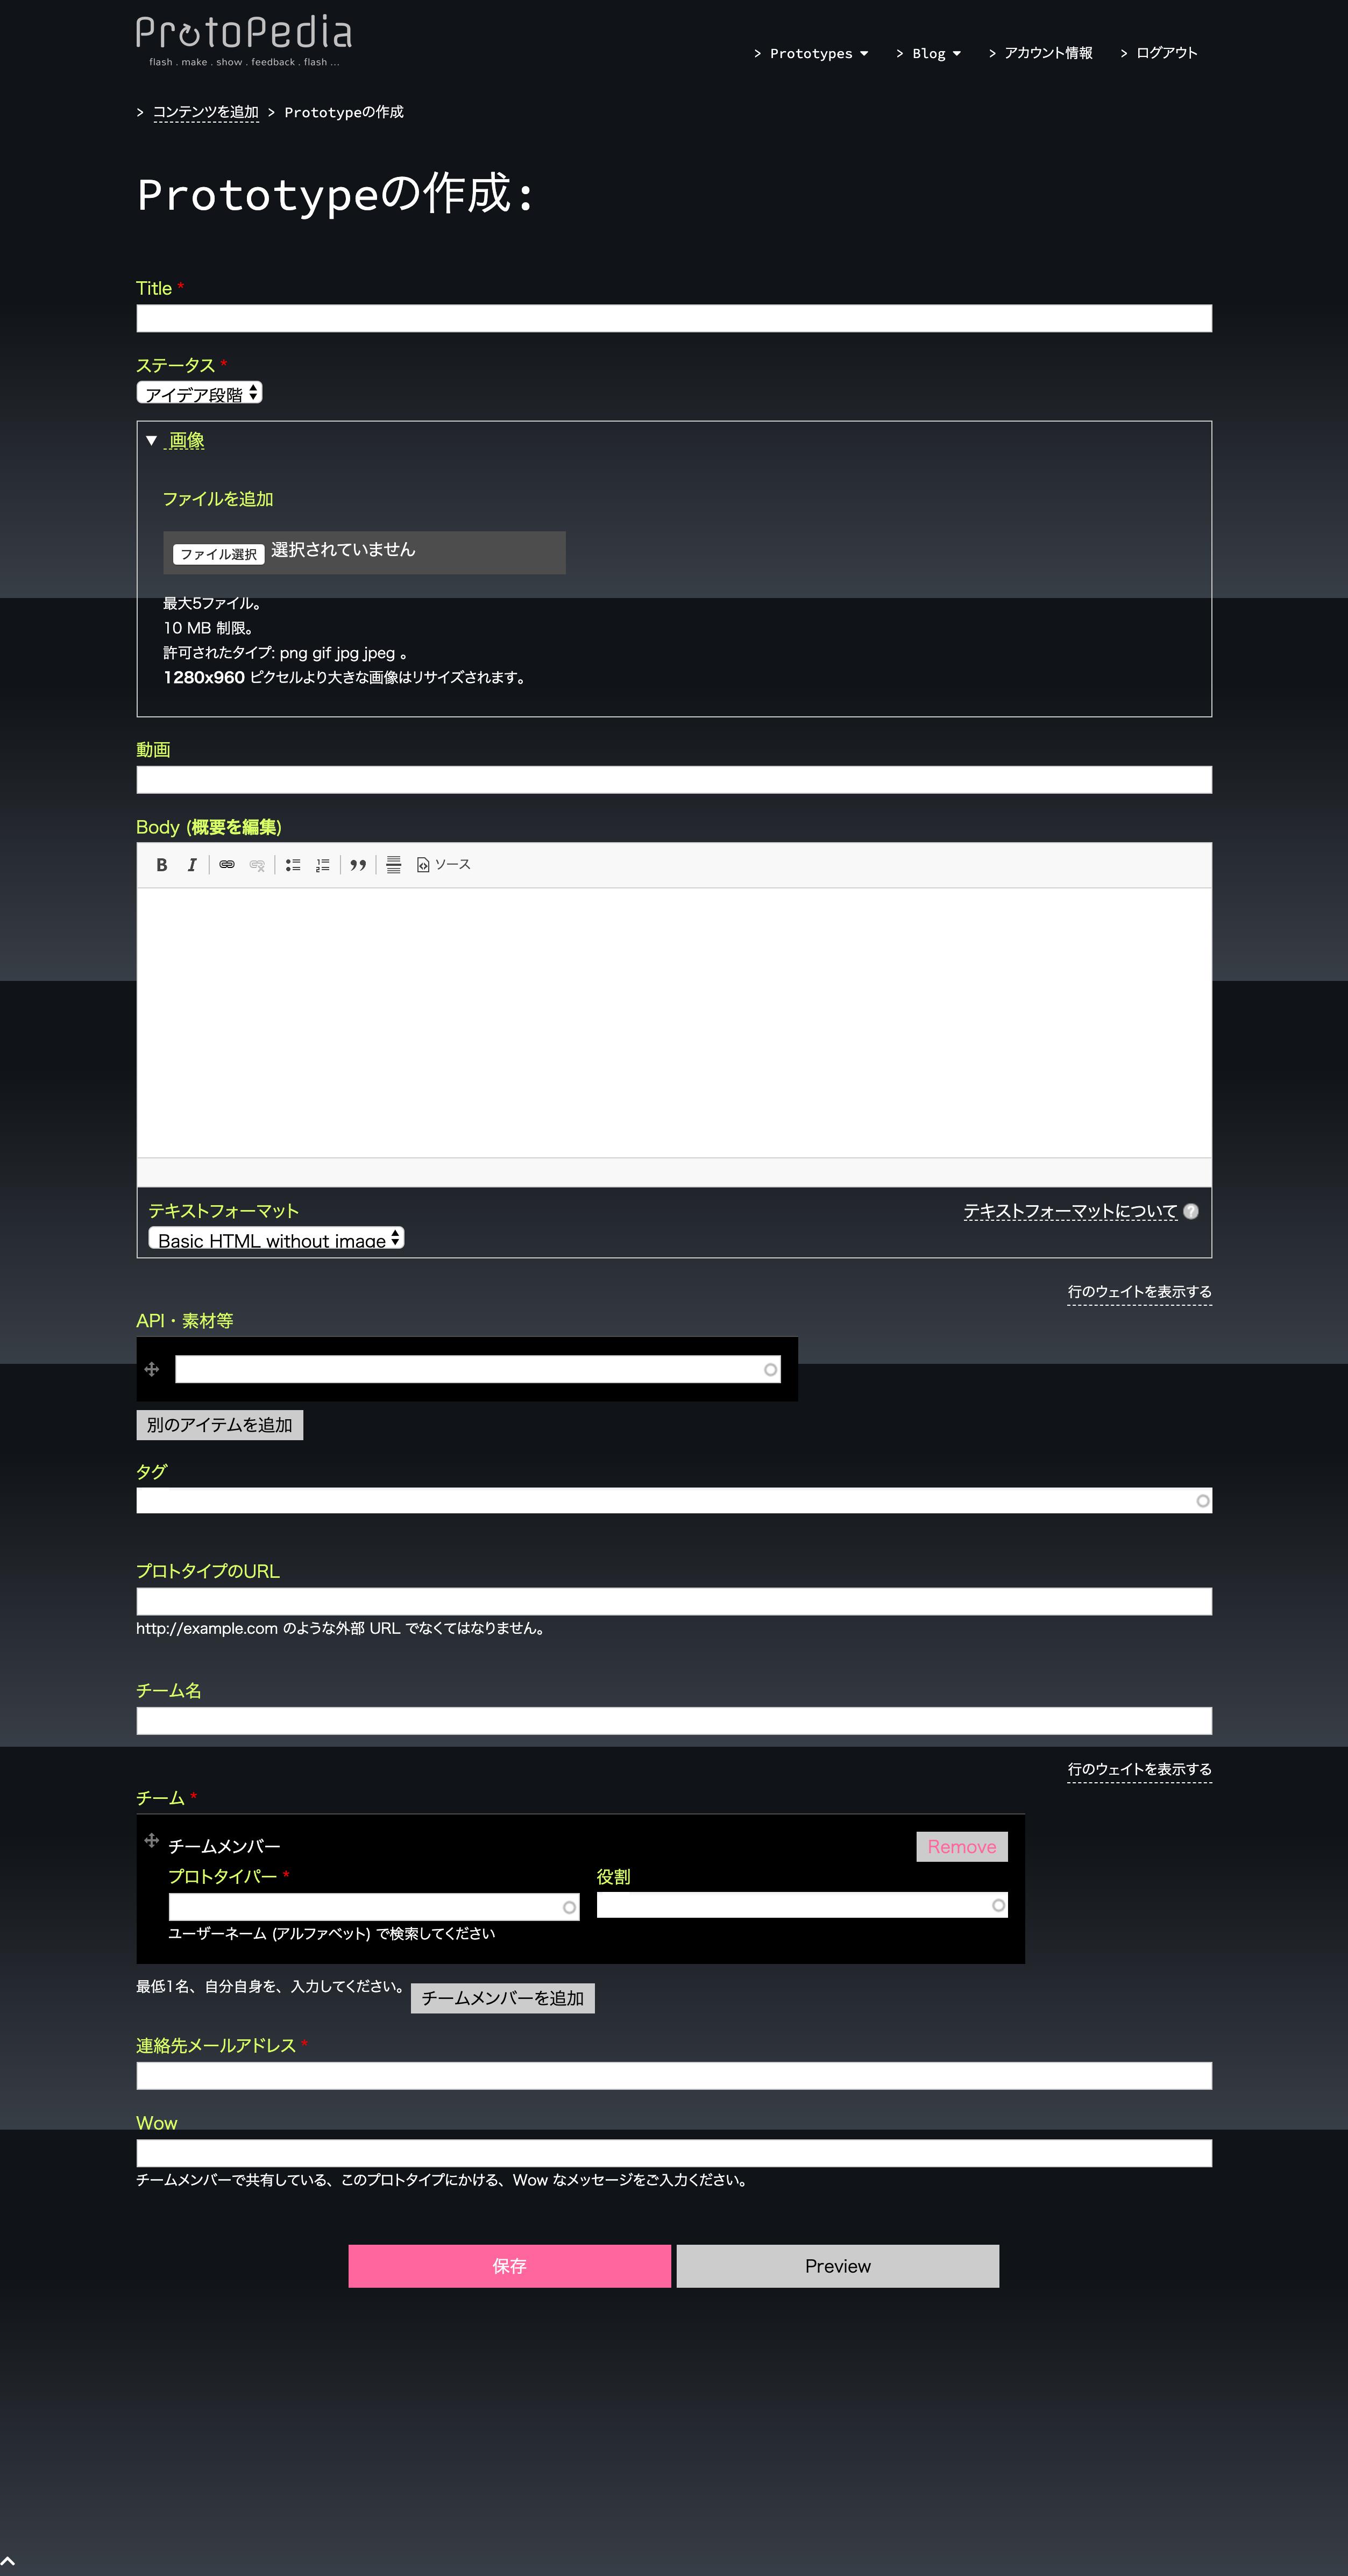 screencapture-protopedia-net-node-add-prototype-2020-03-31-11_46_07.png